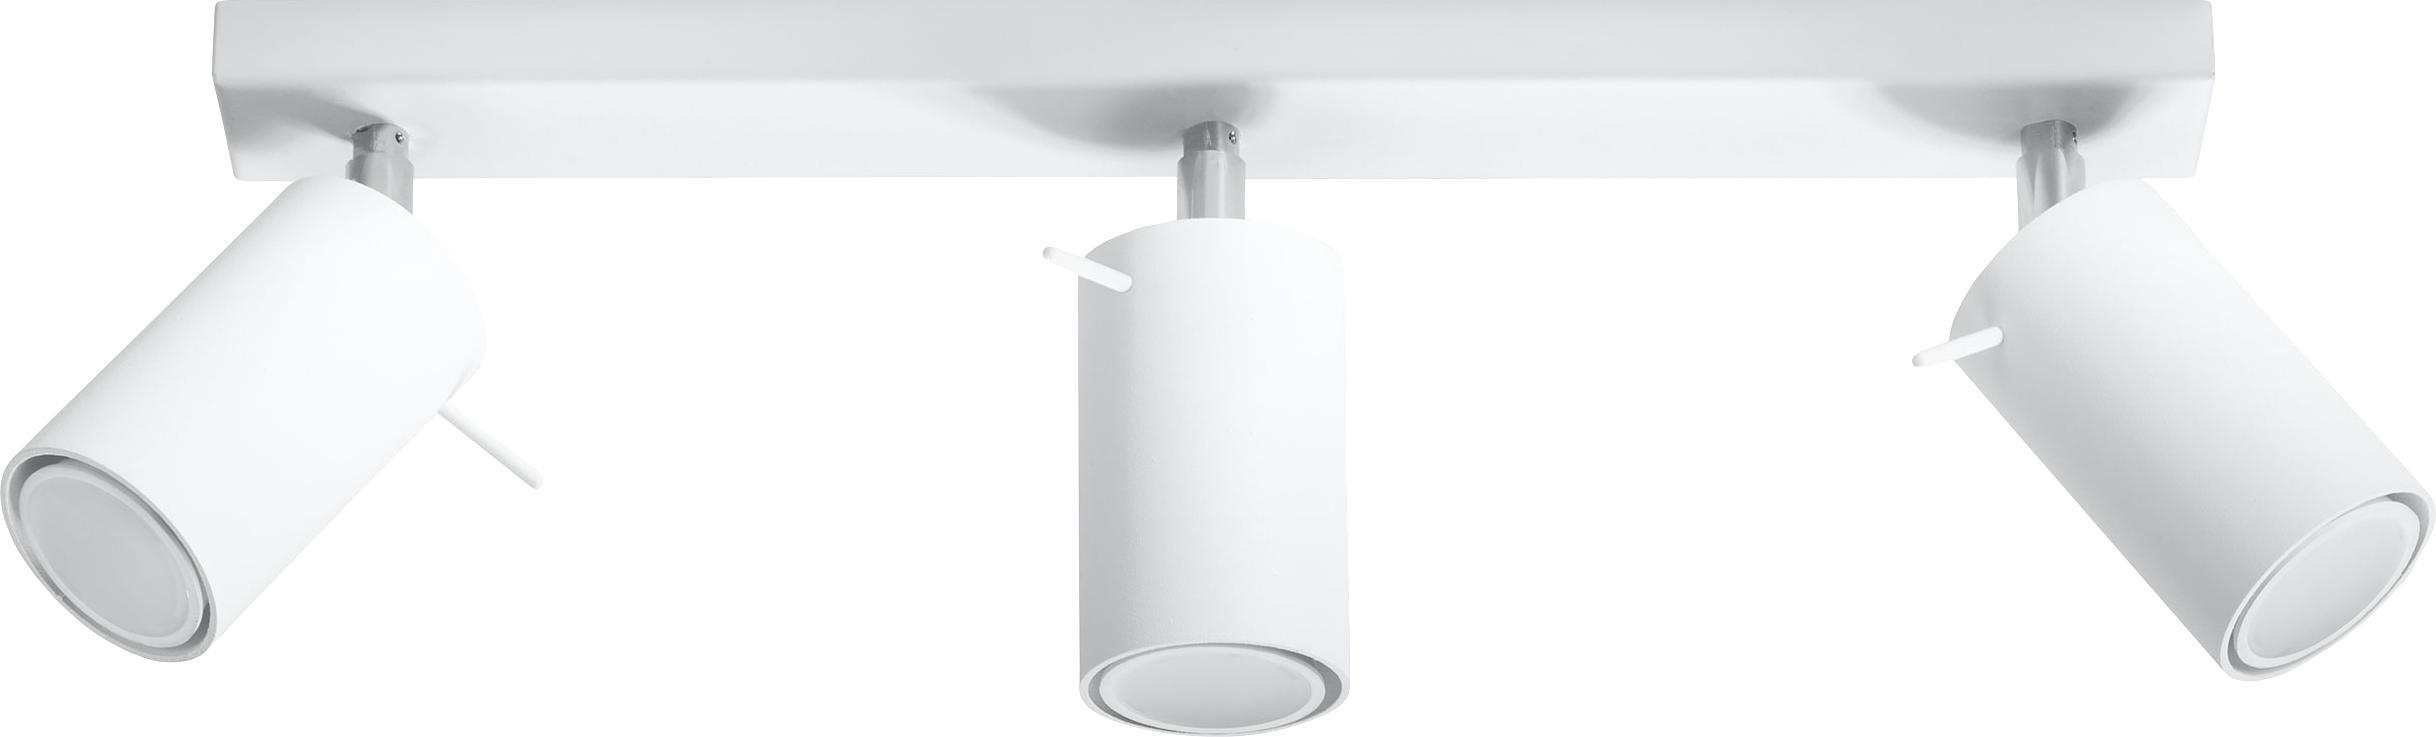 Faretti da soffitto bianchi Etna, Acciaio verniciato, Bianco, Larg. 45 x Alt. 15 cm